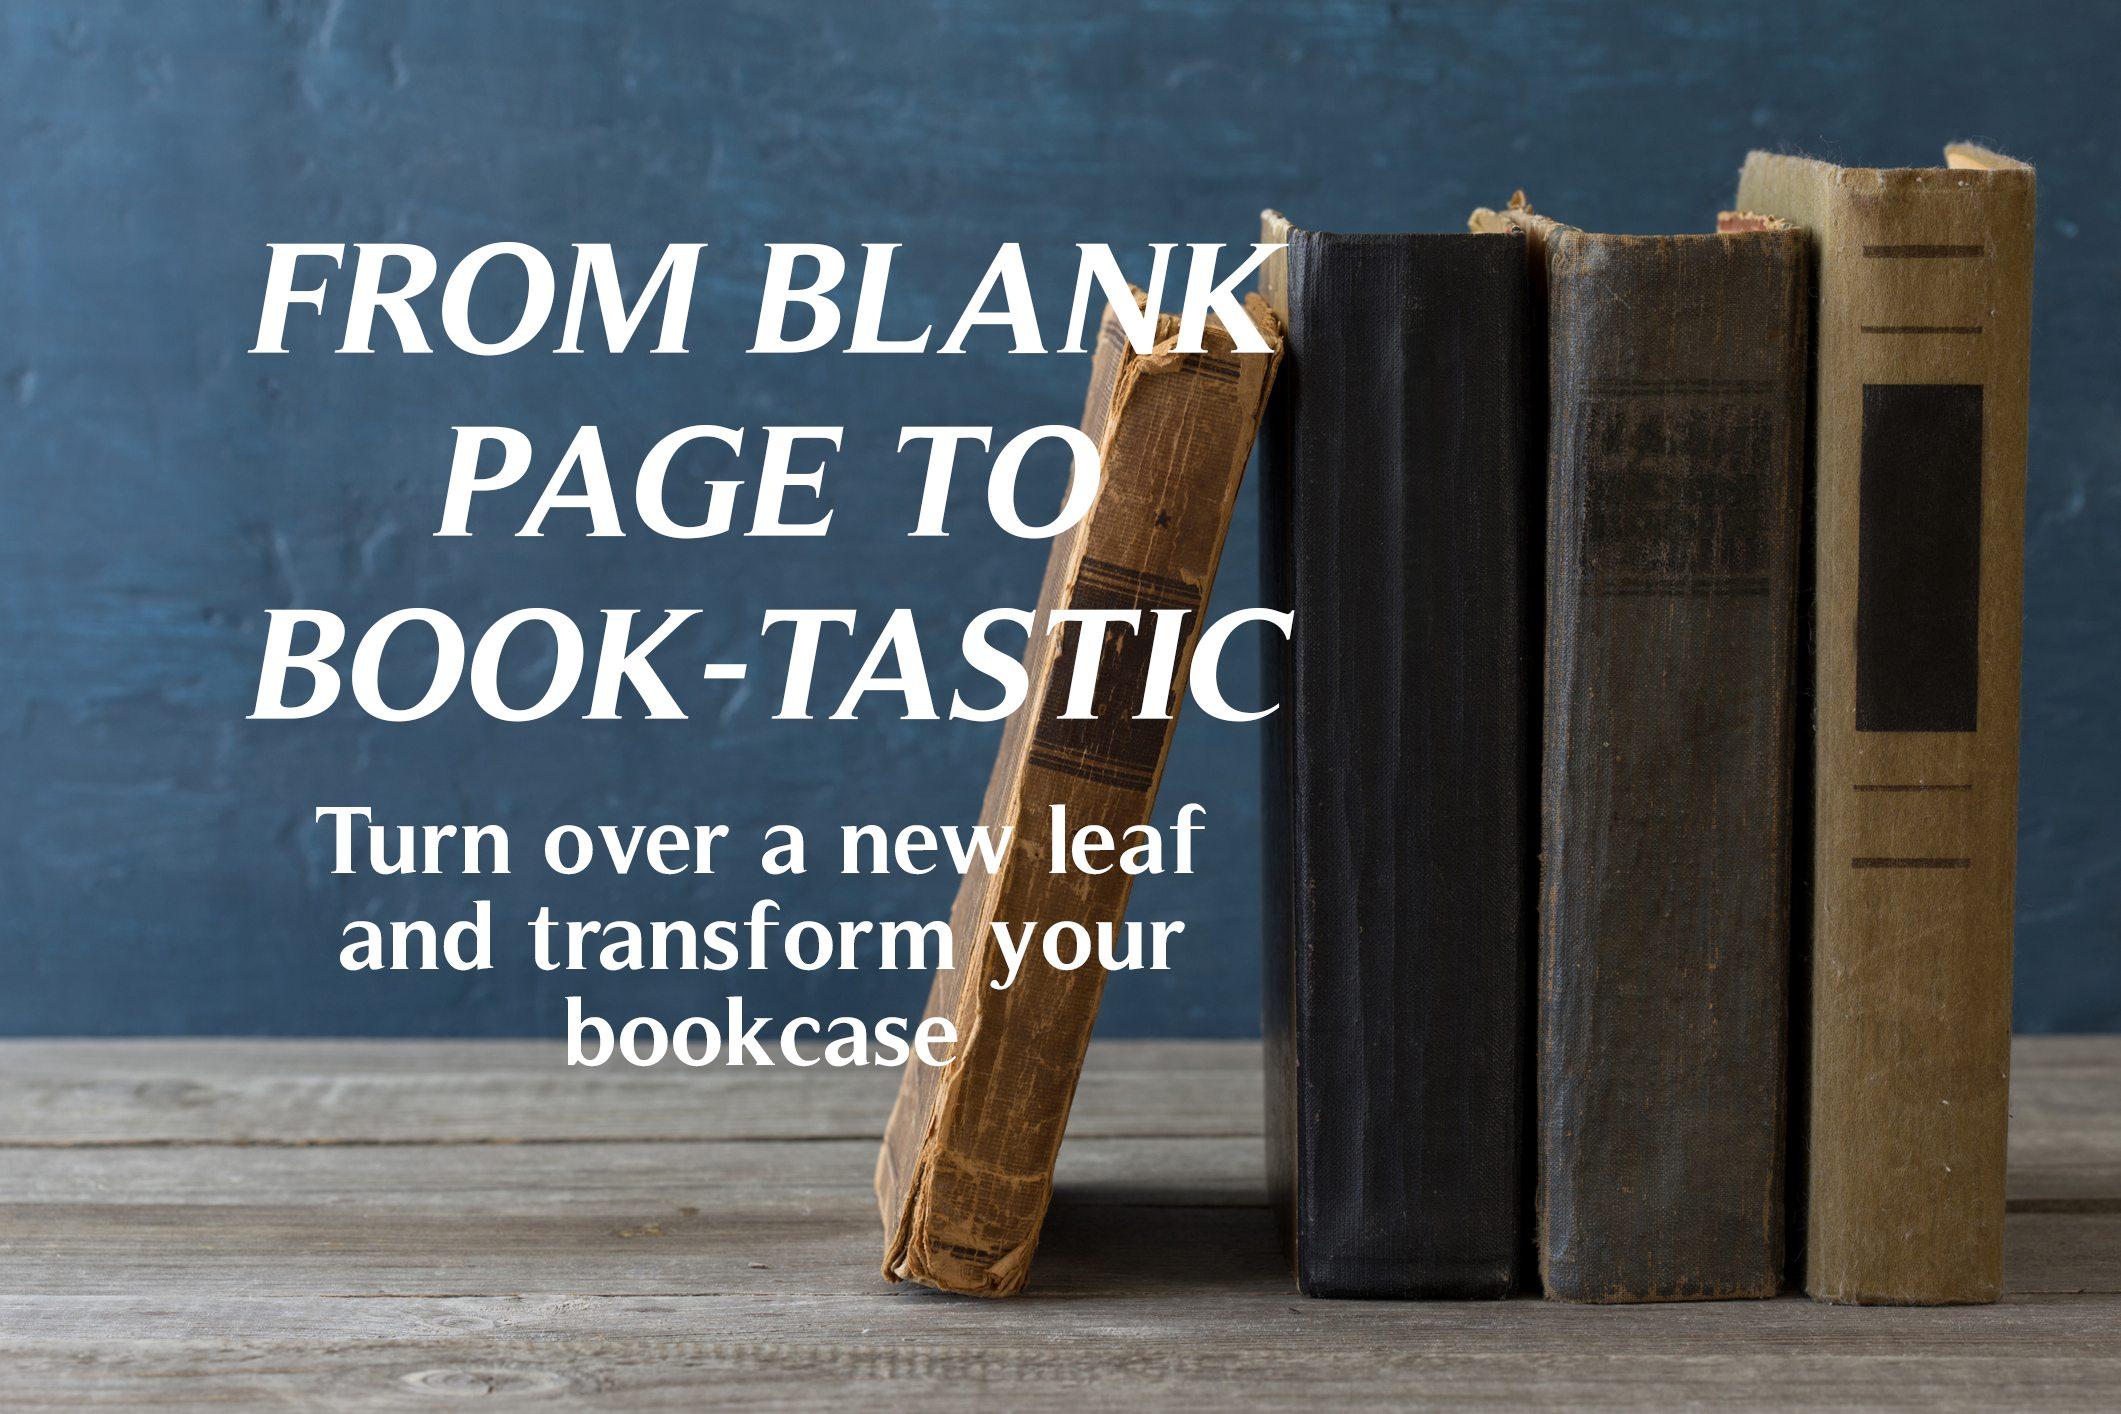 Book-tastic